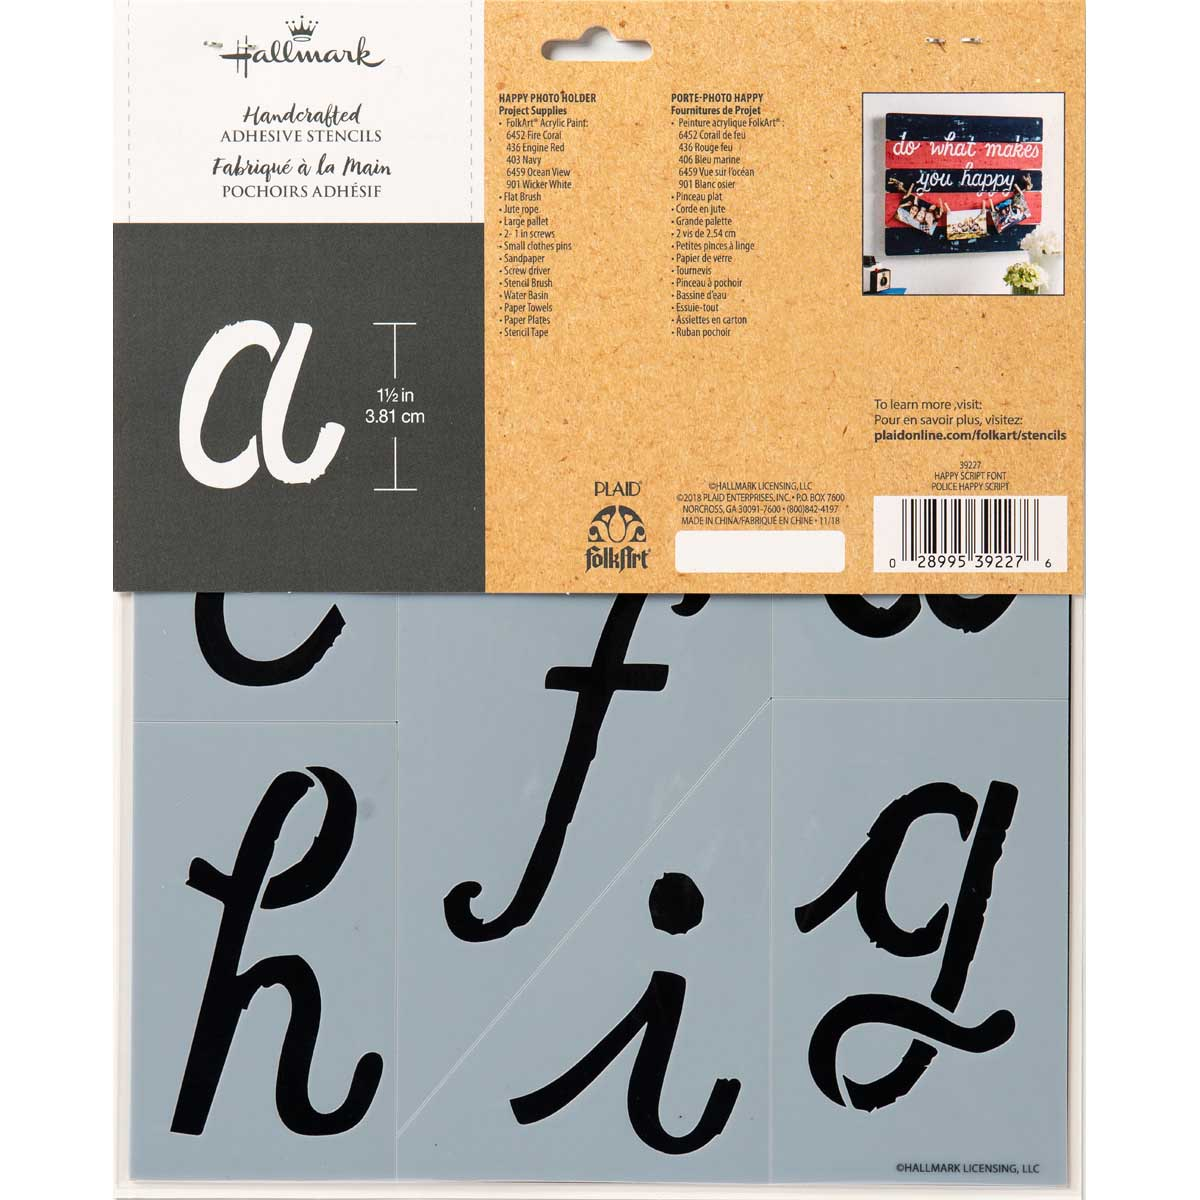 Hallmark Handcrafted Adhesive Stencils - Happy Script Font, 8-1/2